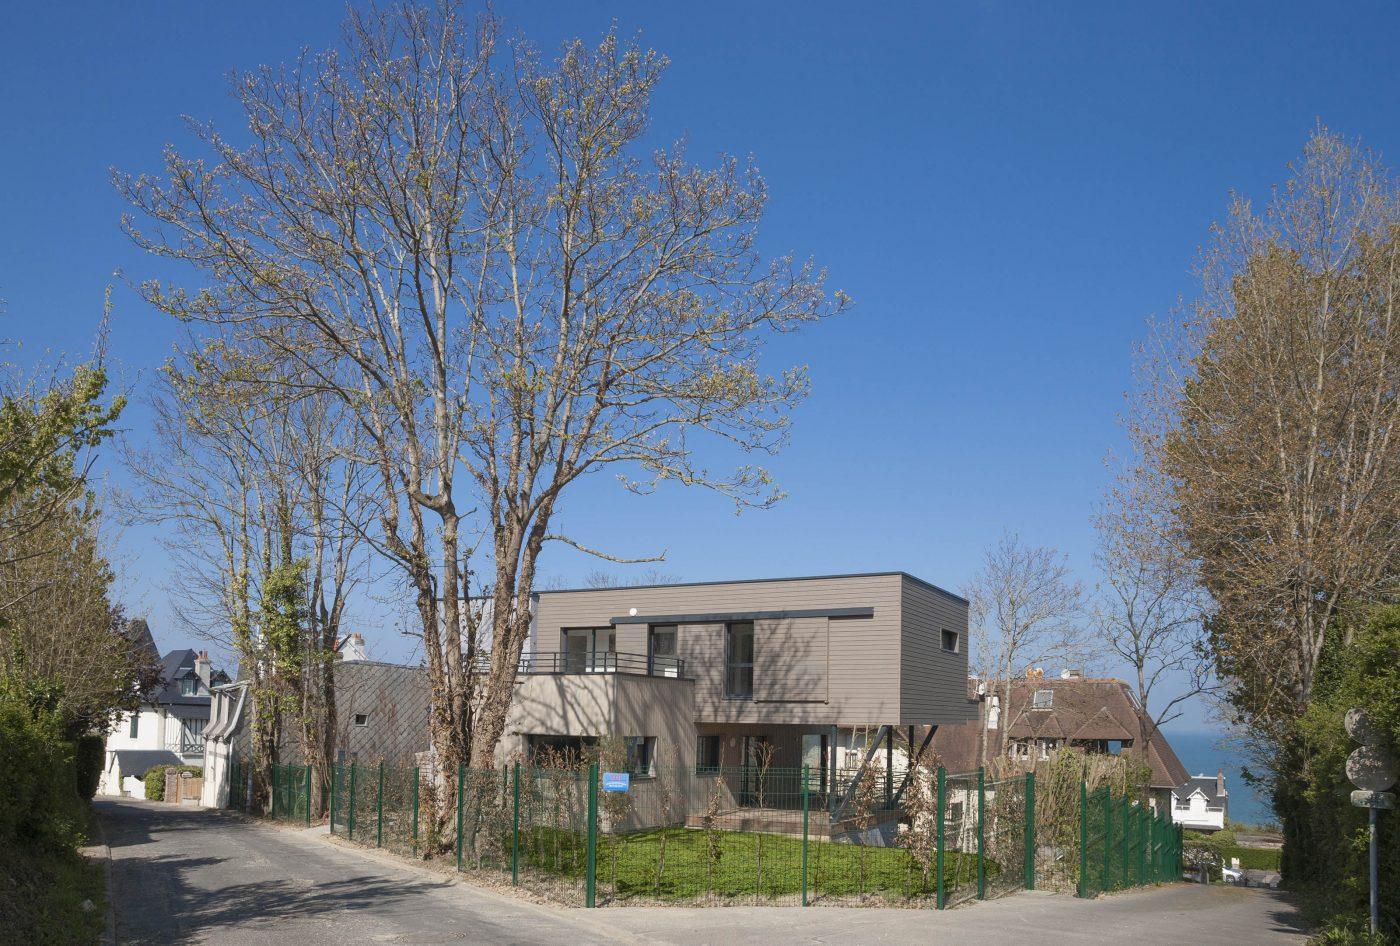 Philippe_Zerbib_Architecte_construction_maisons_ossature_bois_projet_maison_benhamou_MG_8480